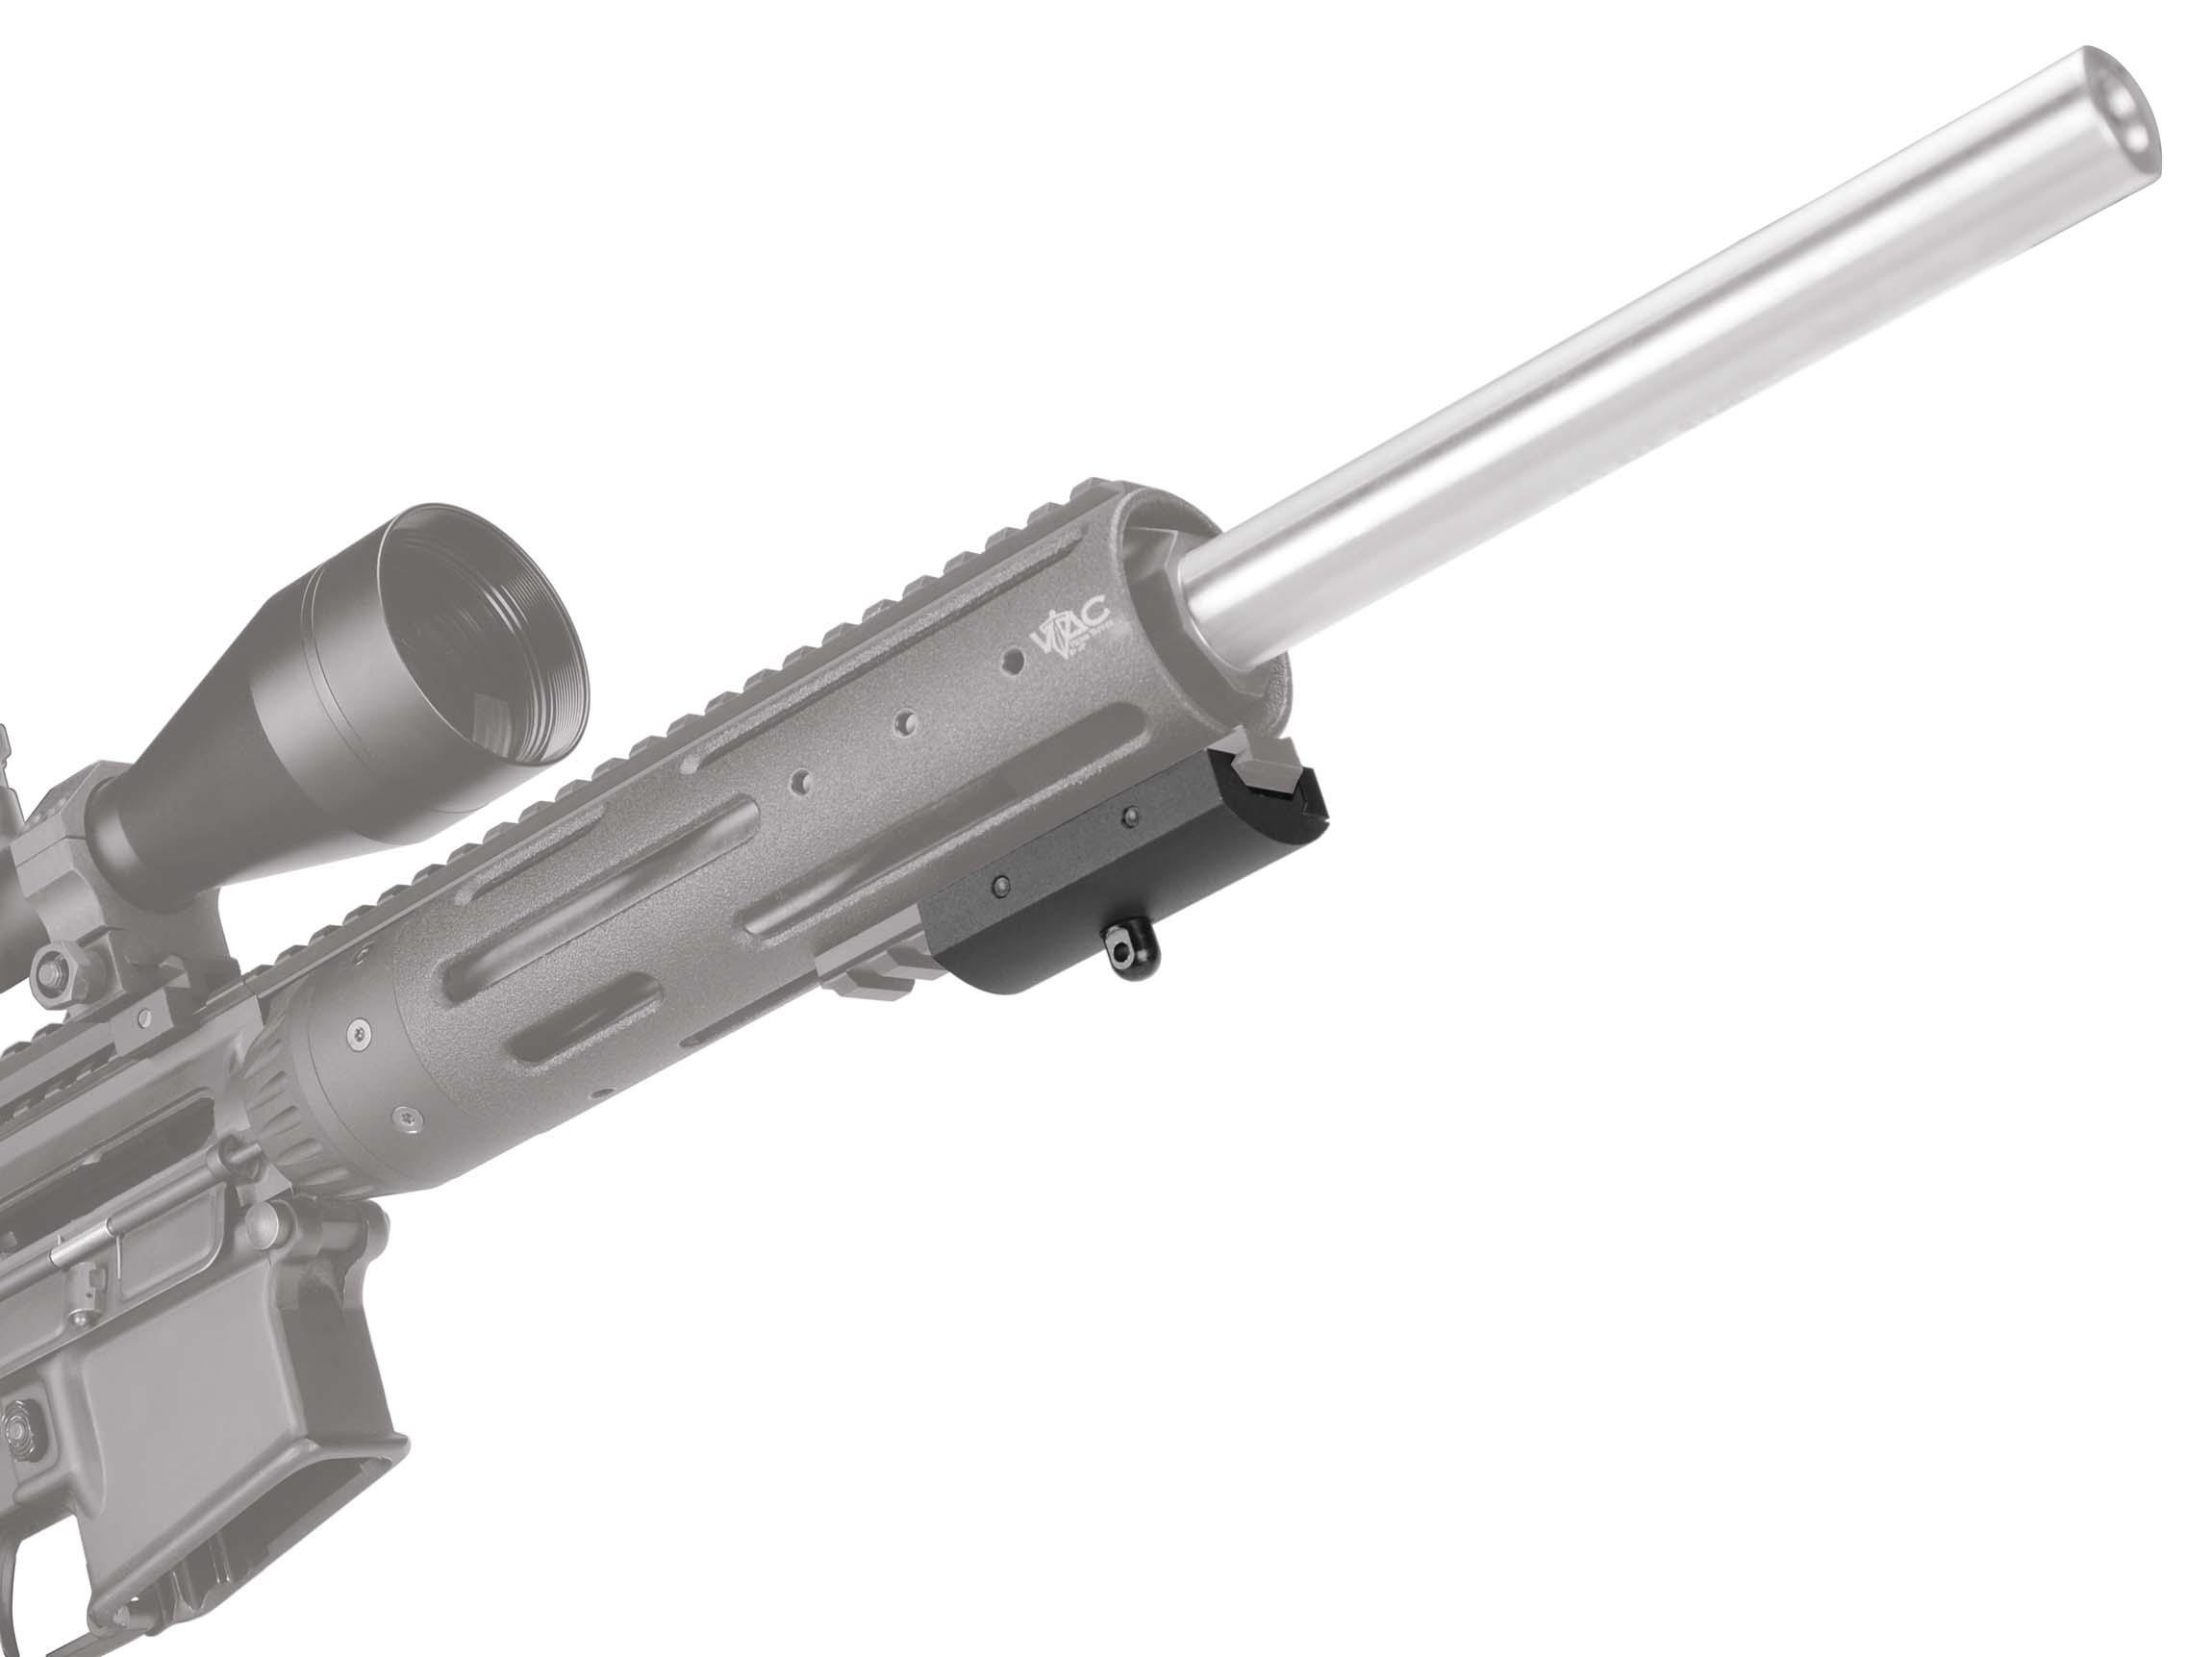 Bipod Adaptor for Picatinney Rail - 535423 gun ghost